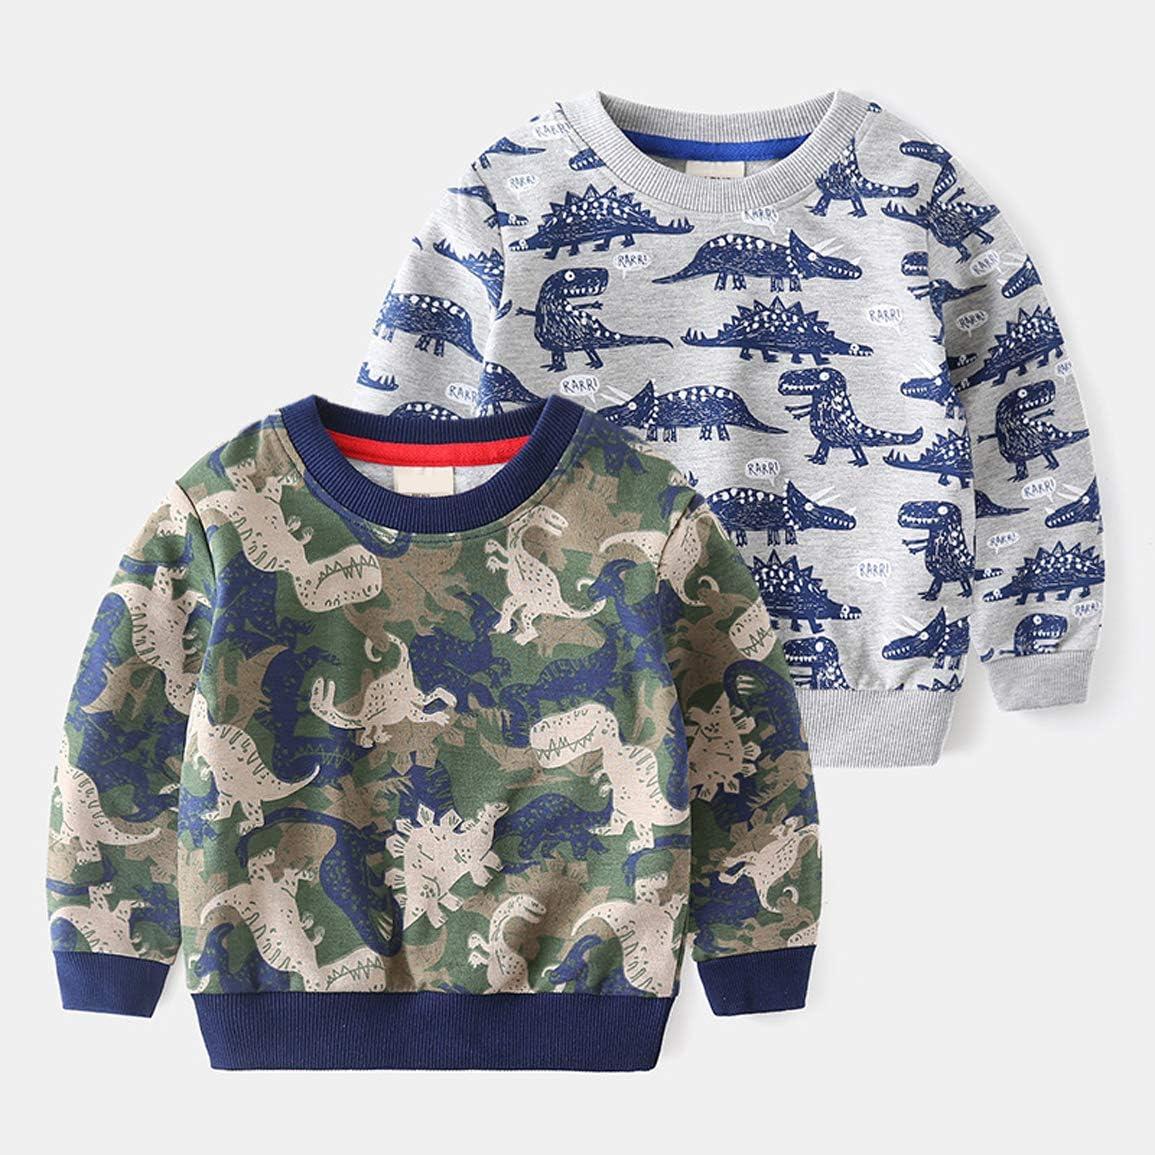 EISHOW Toddler Girls Boys Knit Sweater Cartoon Dinosaur Long Sleeve Round Neck Casual Pullover Sweatshirt Top for Kids